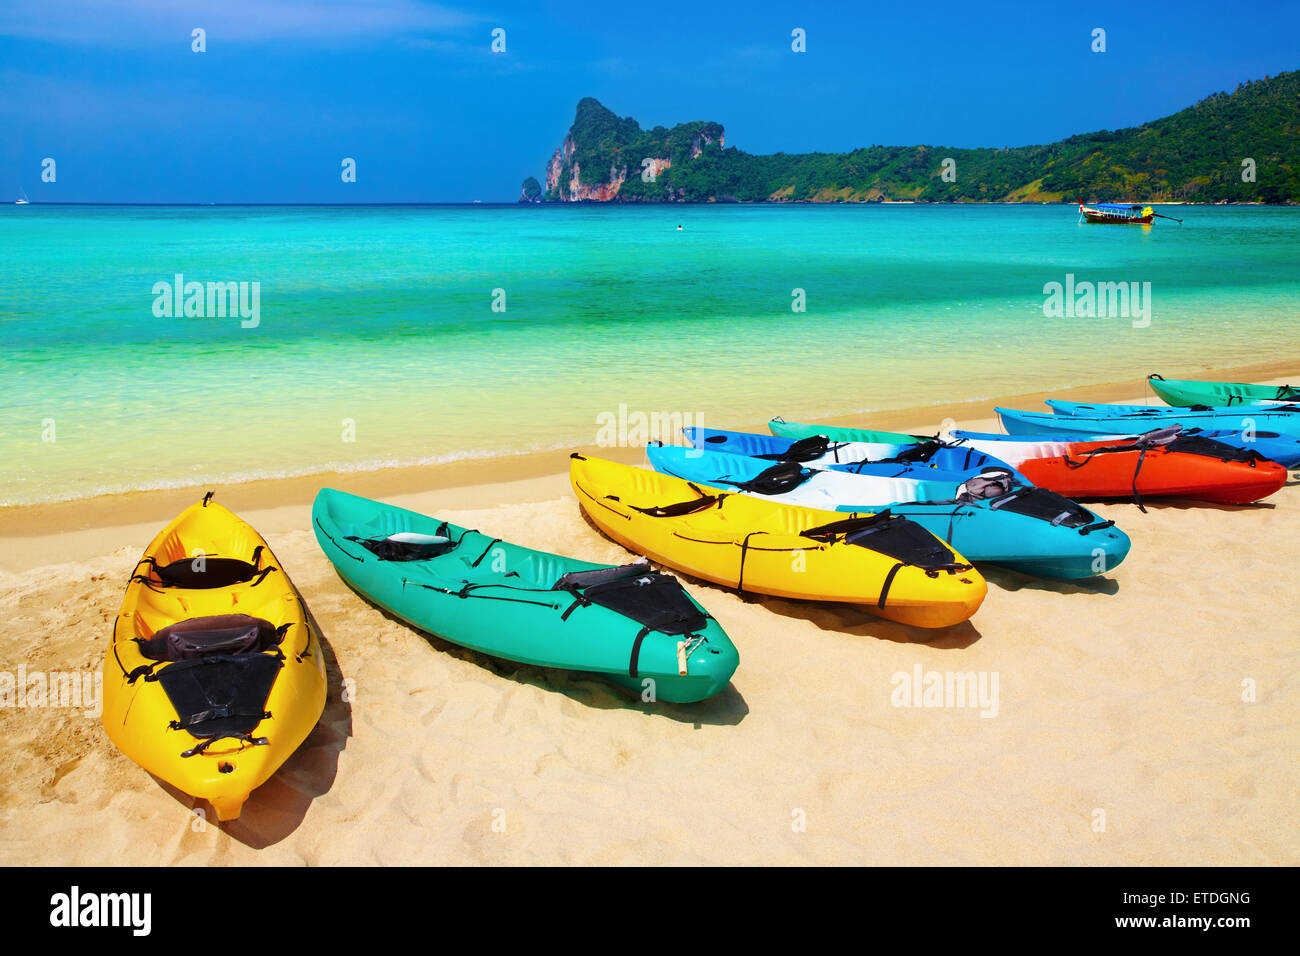 Kayaks on the tropical beach, Phi-Phi Don island, Thailand Stock Photo